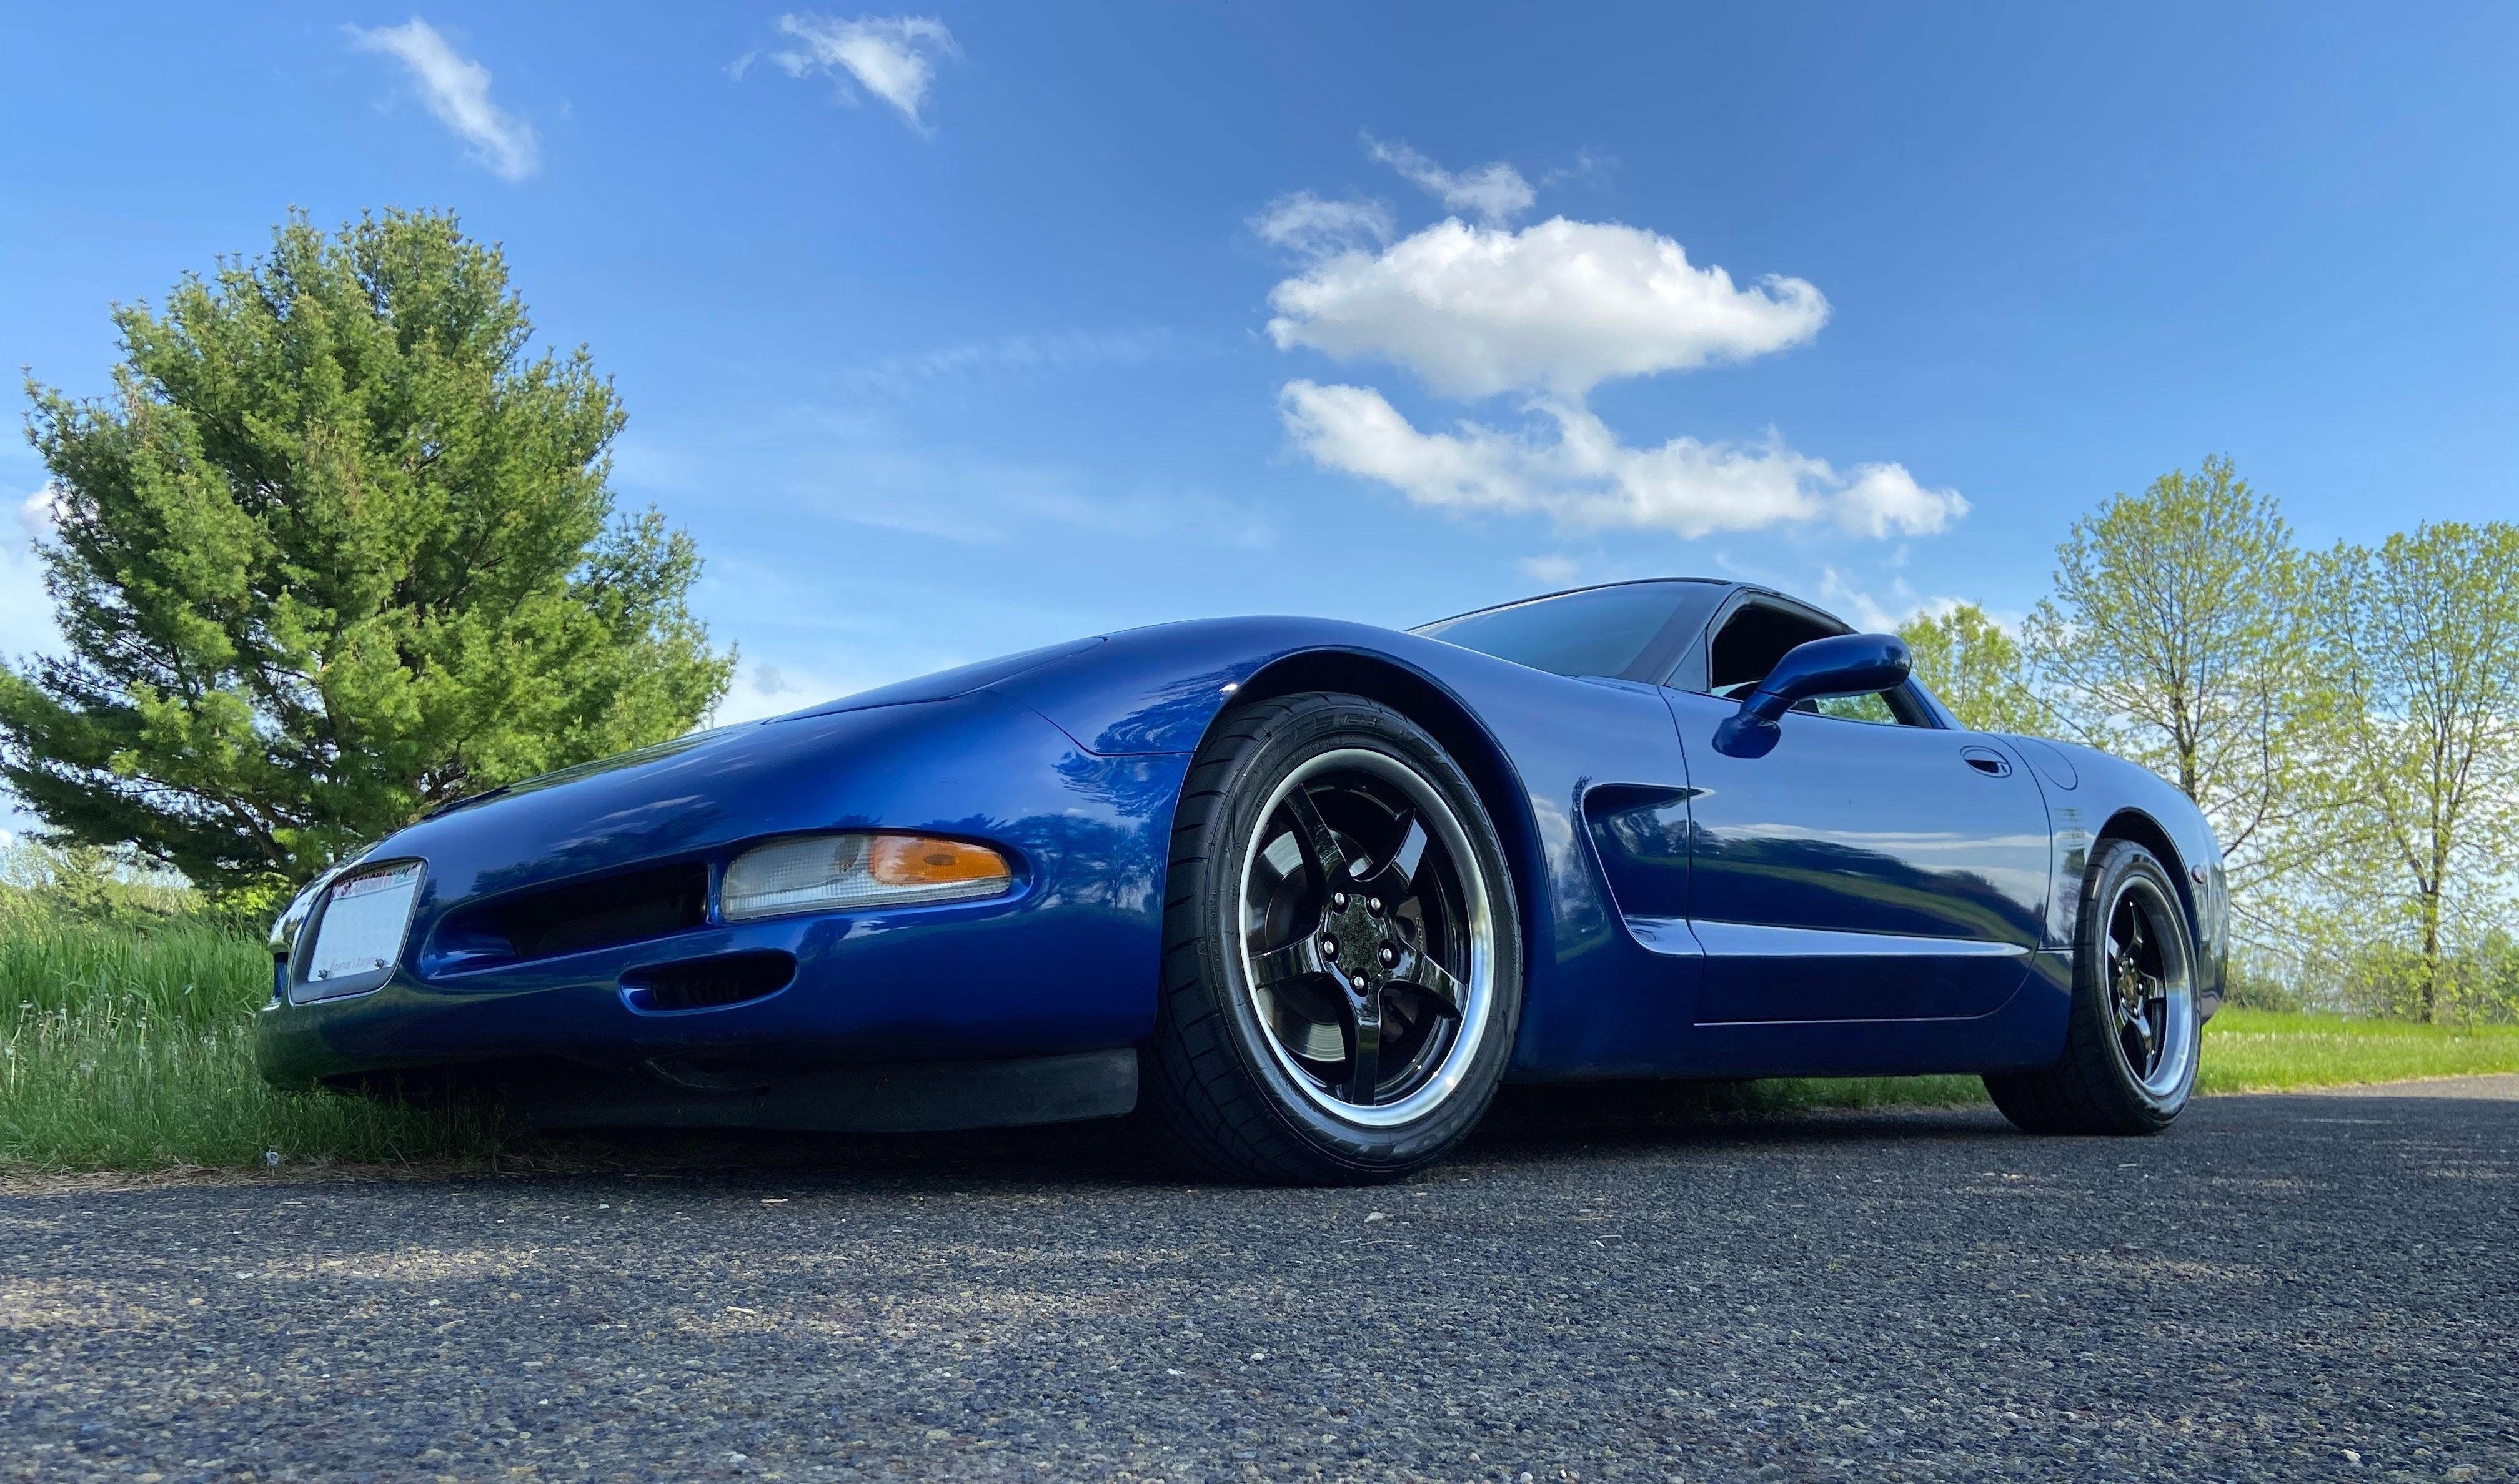 Fits Corvette C5 Rims Cv05 Dd Black Corvette Wheels 18x10 5 18x9 5 Staggered Black Corvette Corvette Corvette Wheels